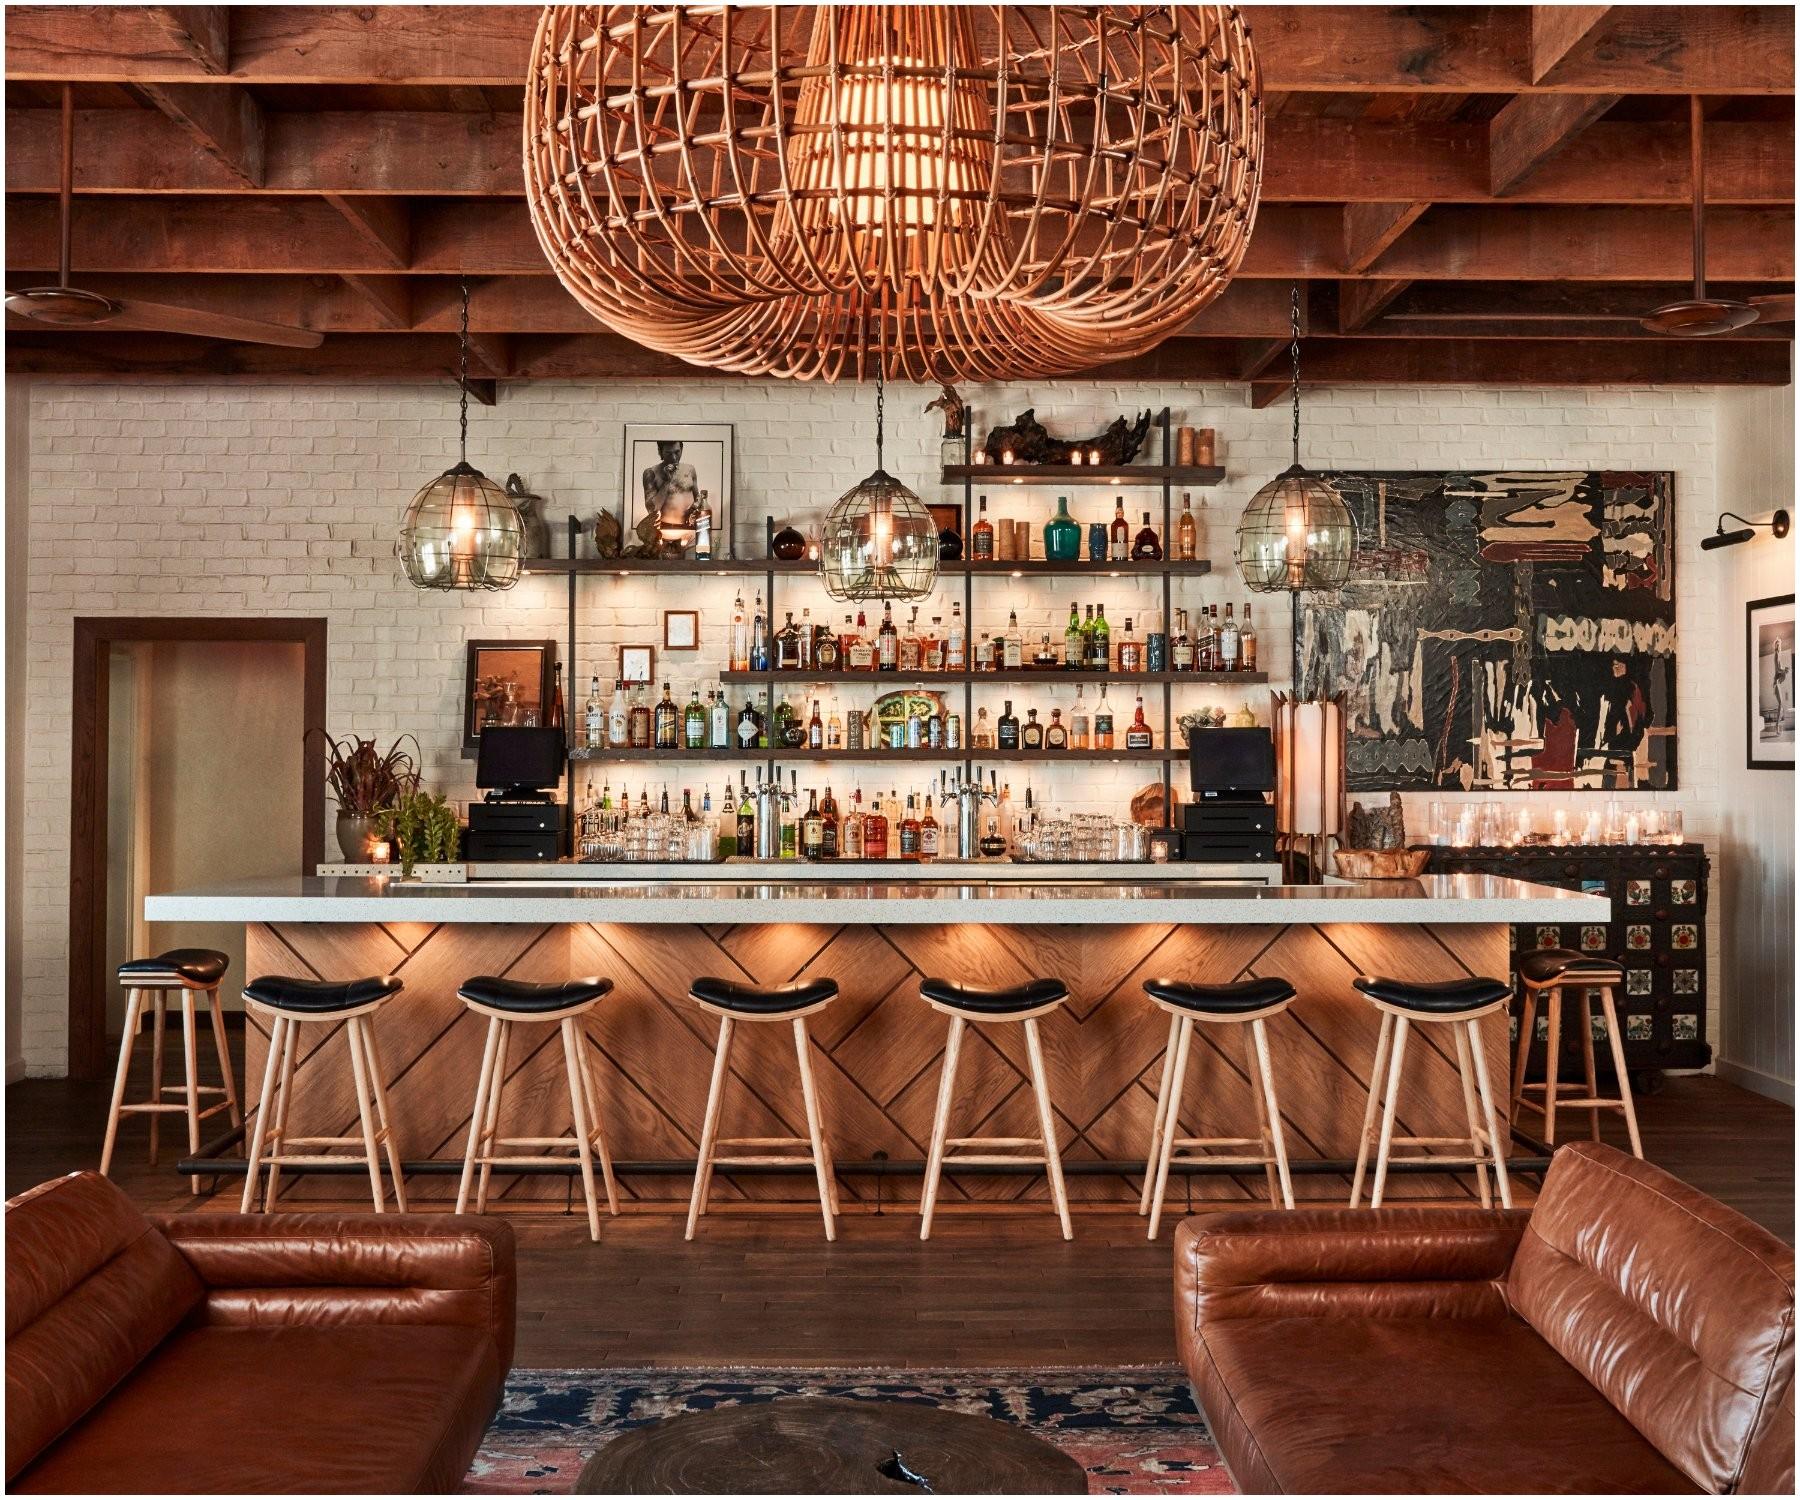 Top Italian Restaurants In Huntington Beach